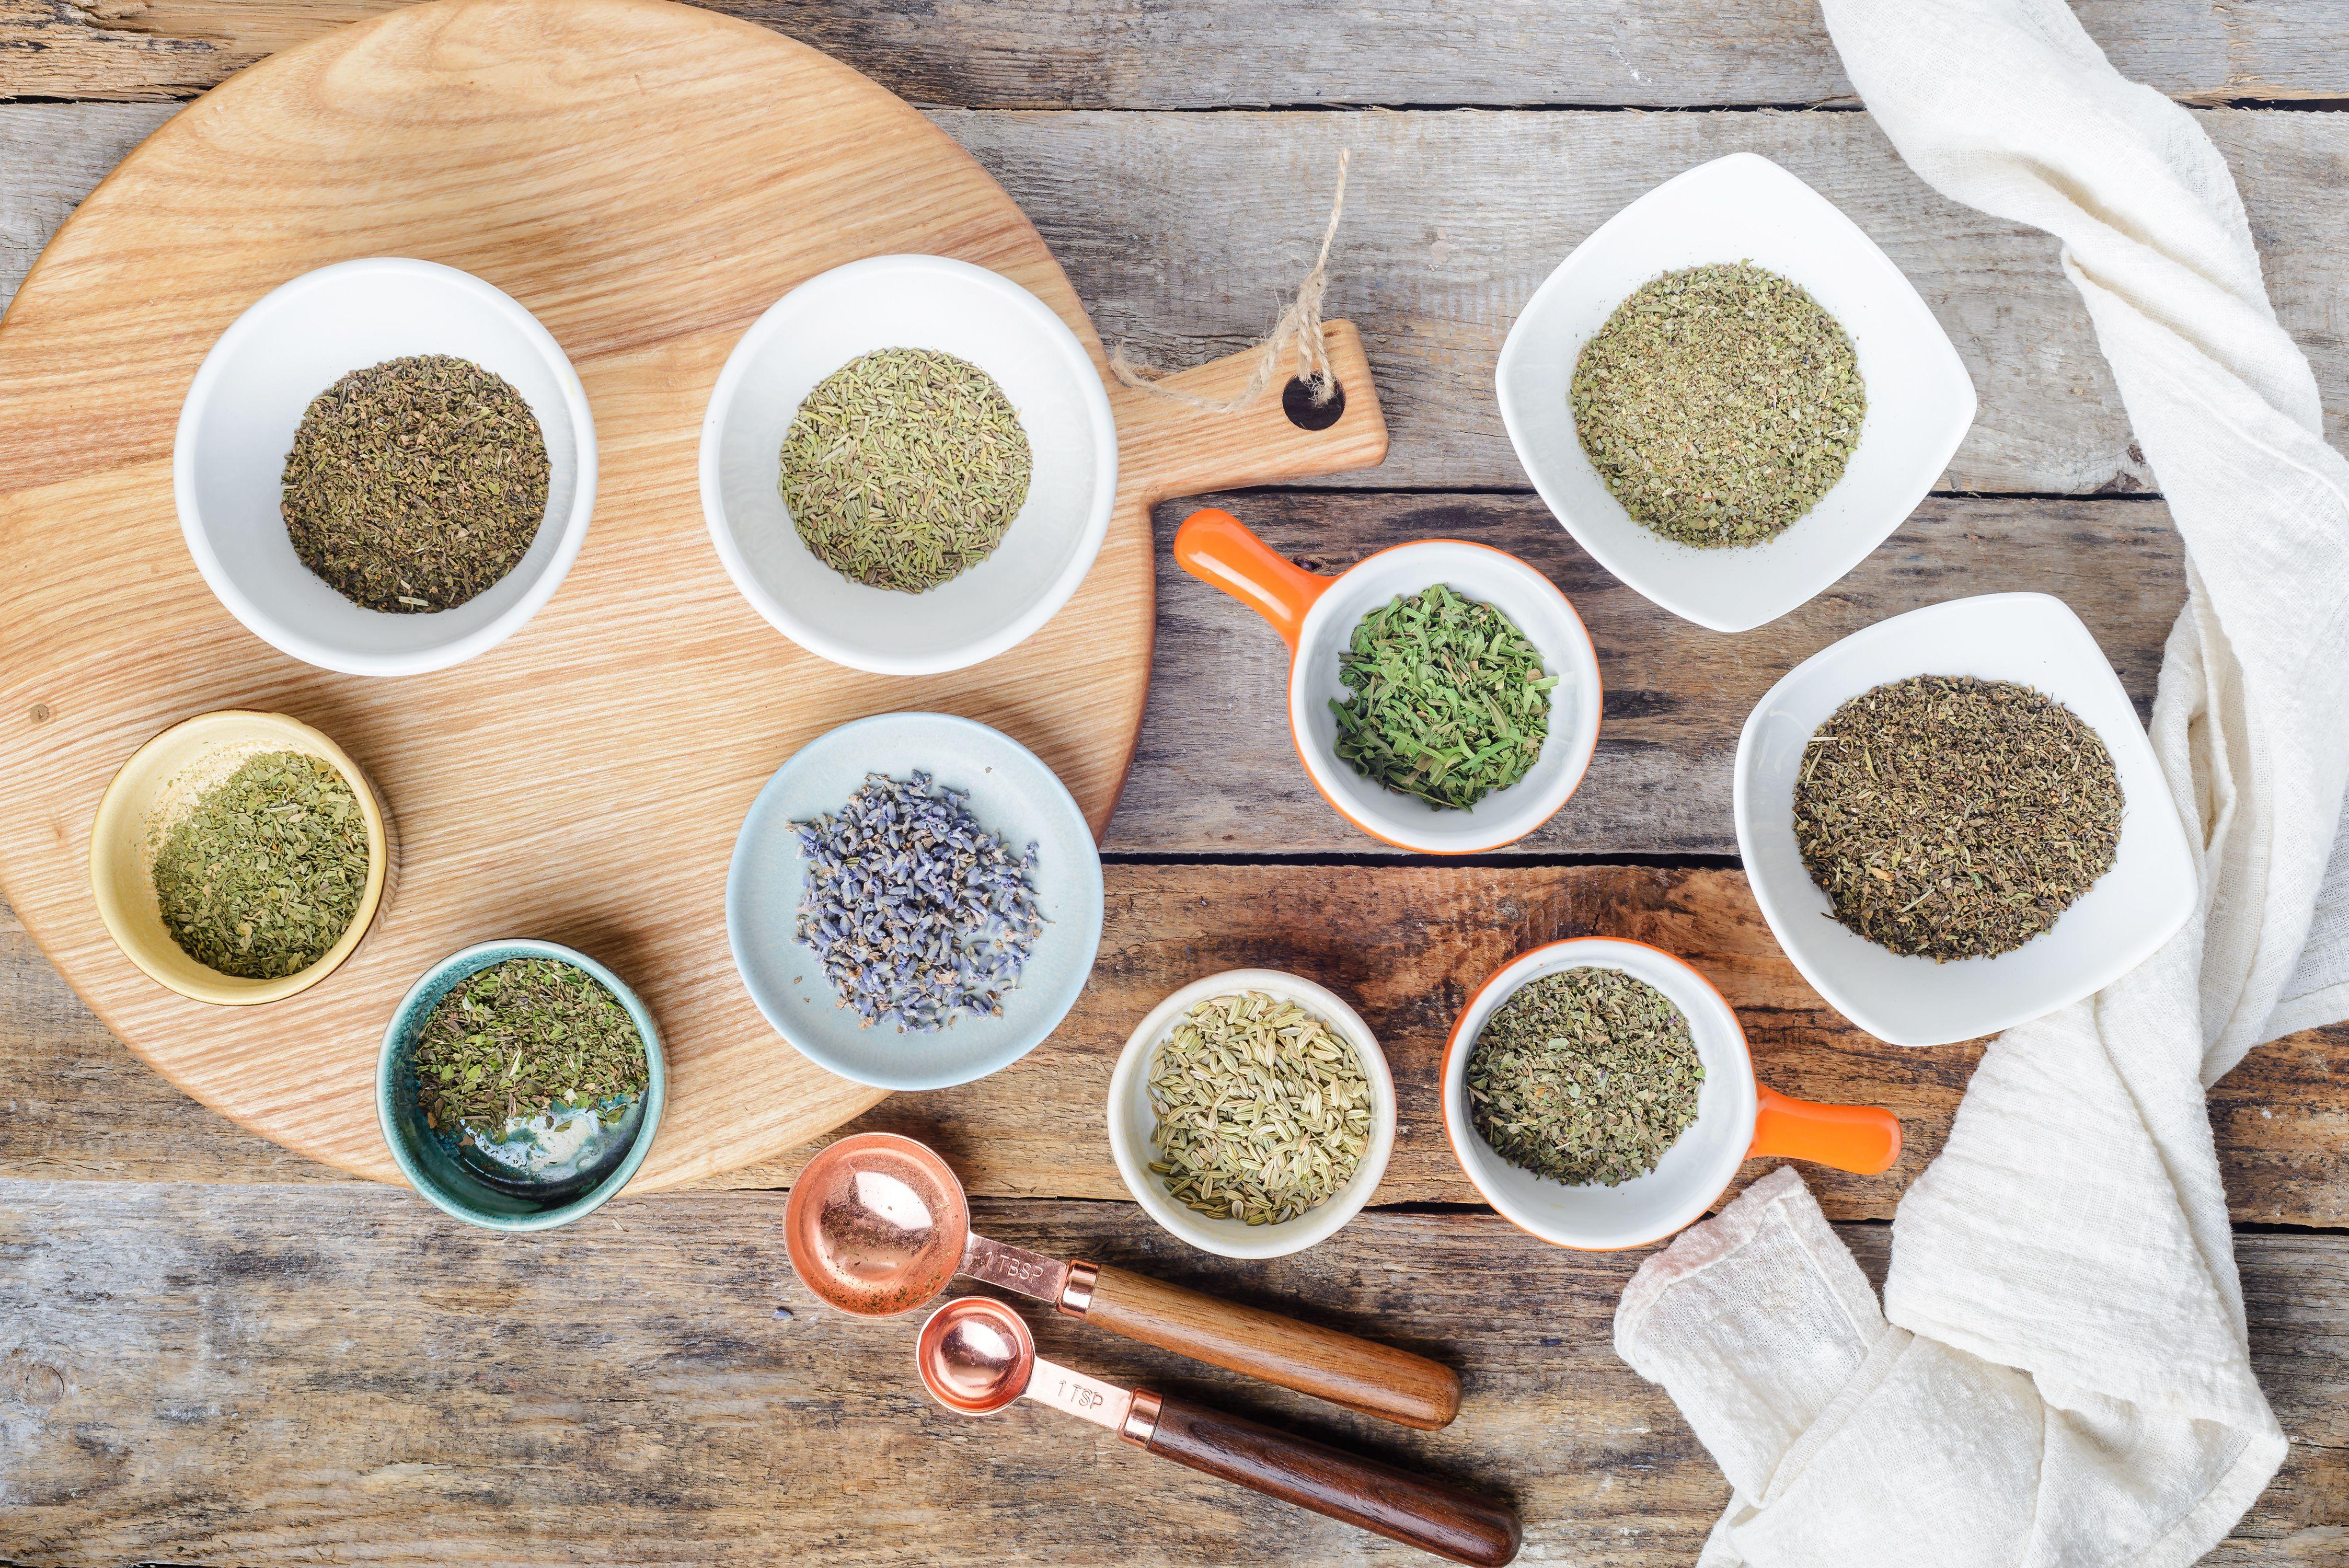 Ingredients for Herbs de Provence